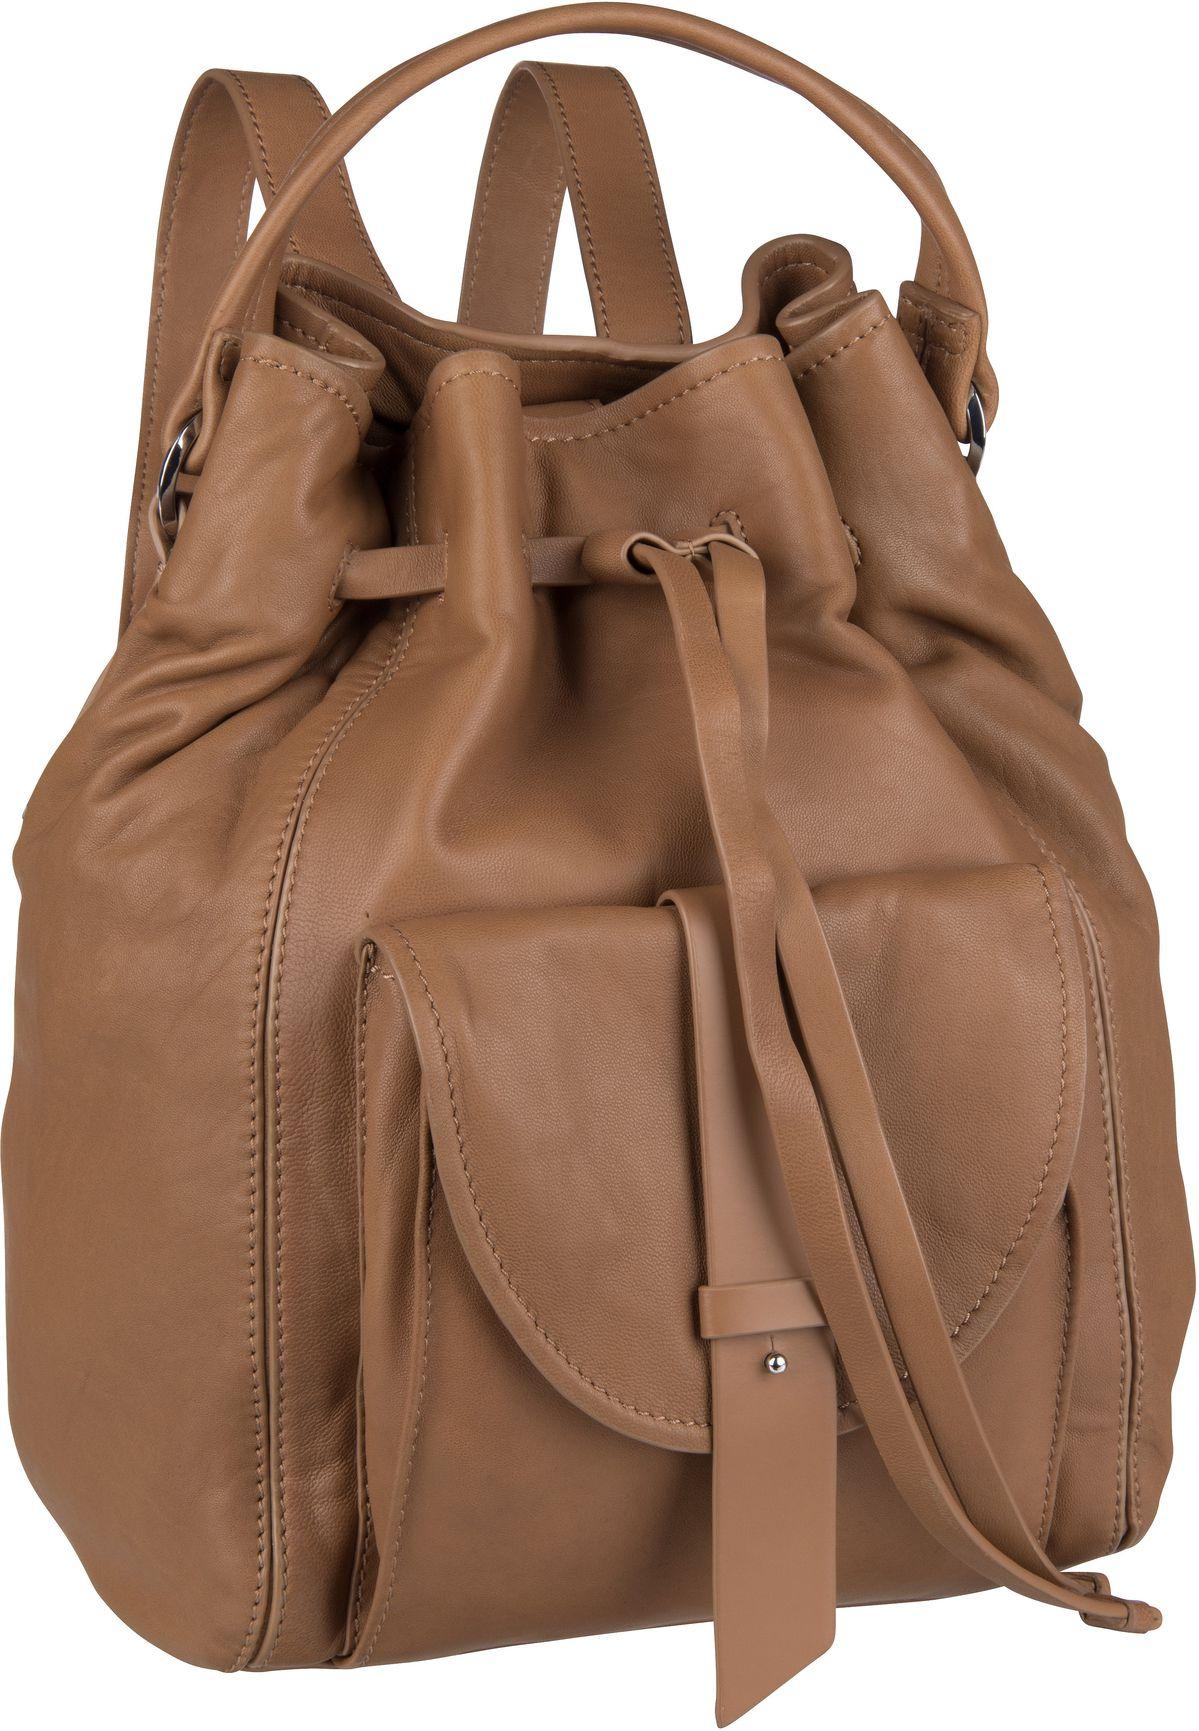 Berlin Rucksack / Daypack Soft Bucket Backpack M Tiger's Eye